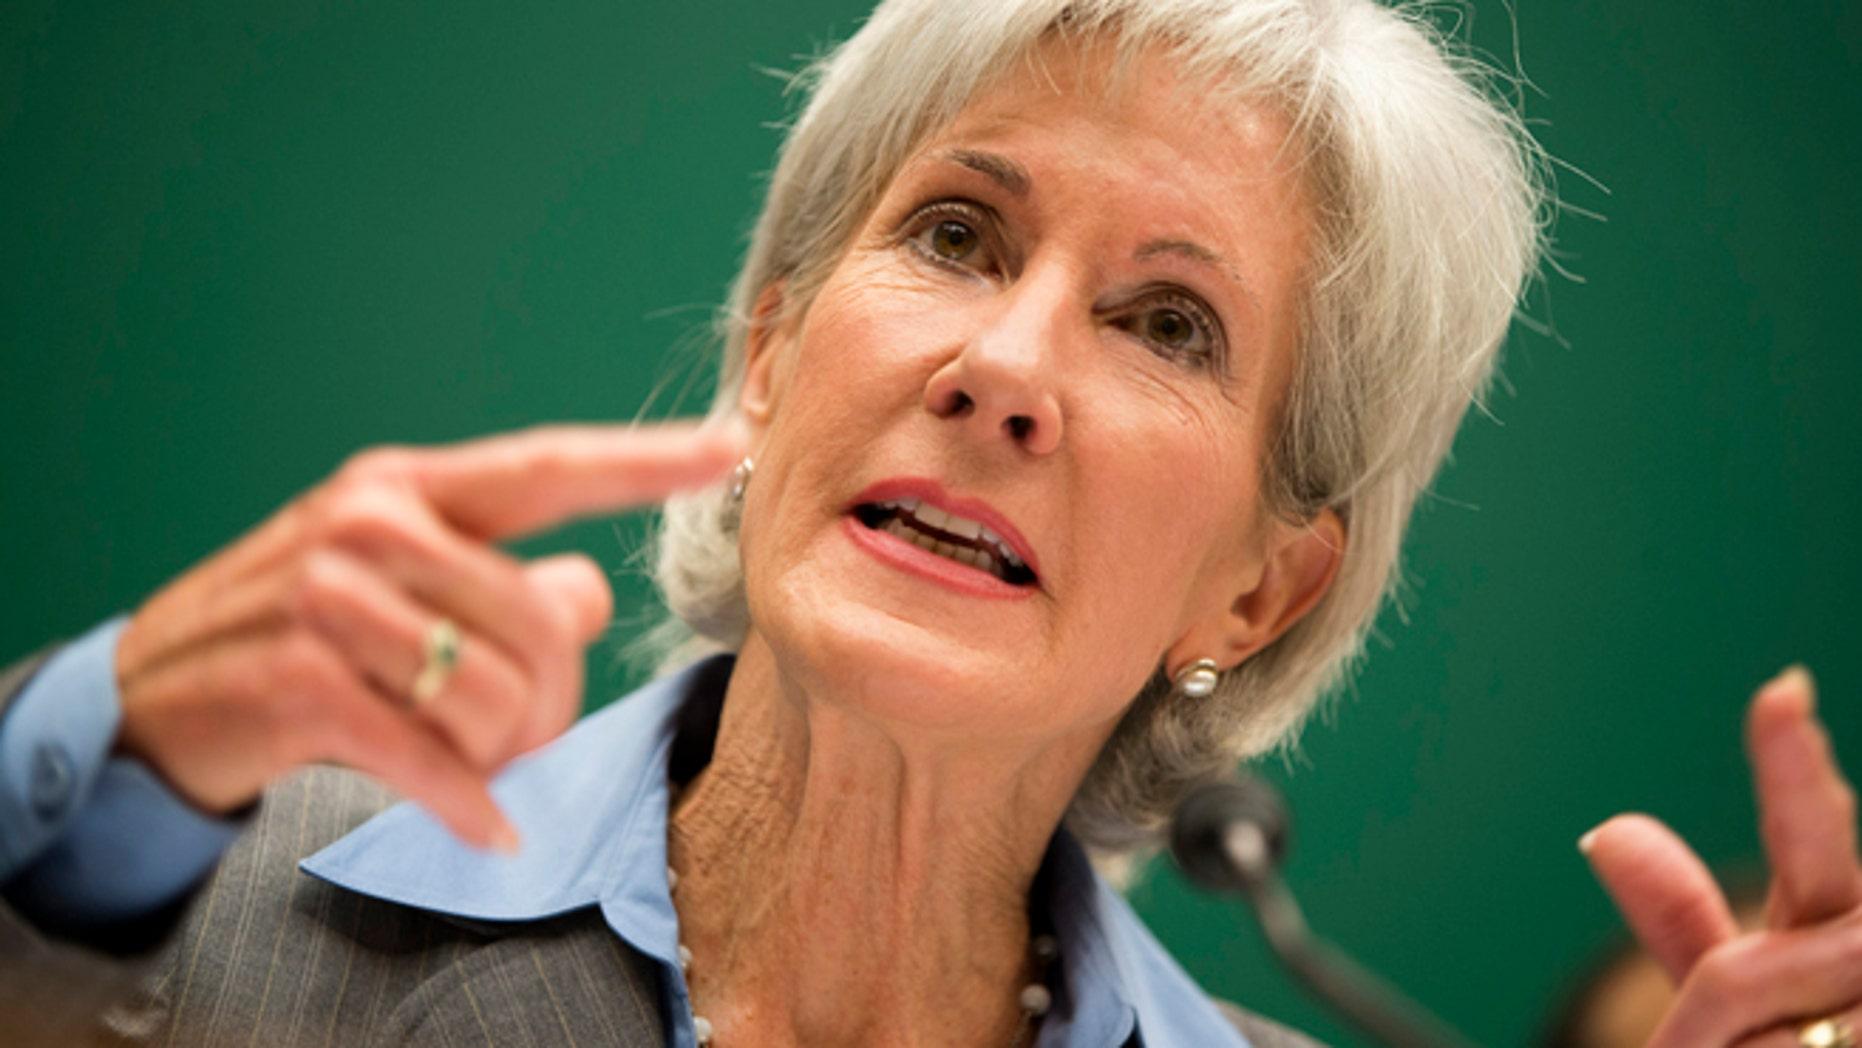 Health and Human Services Secretary Kathleen Sebelius testifies on Capitol Hill in Washington, Wednesday, Oct. 30, 2013.